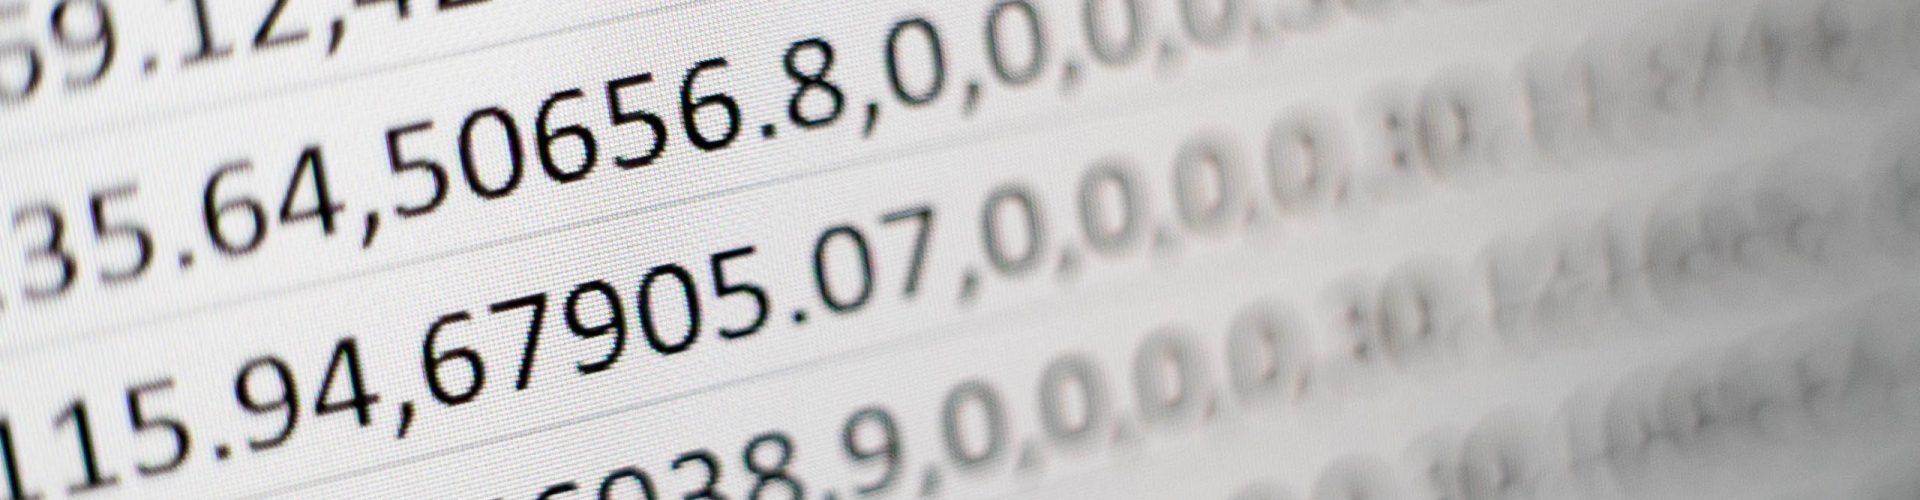 banner-data-statistics-page